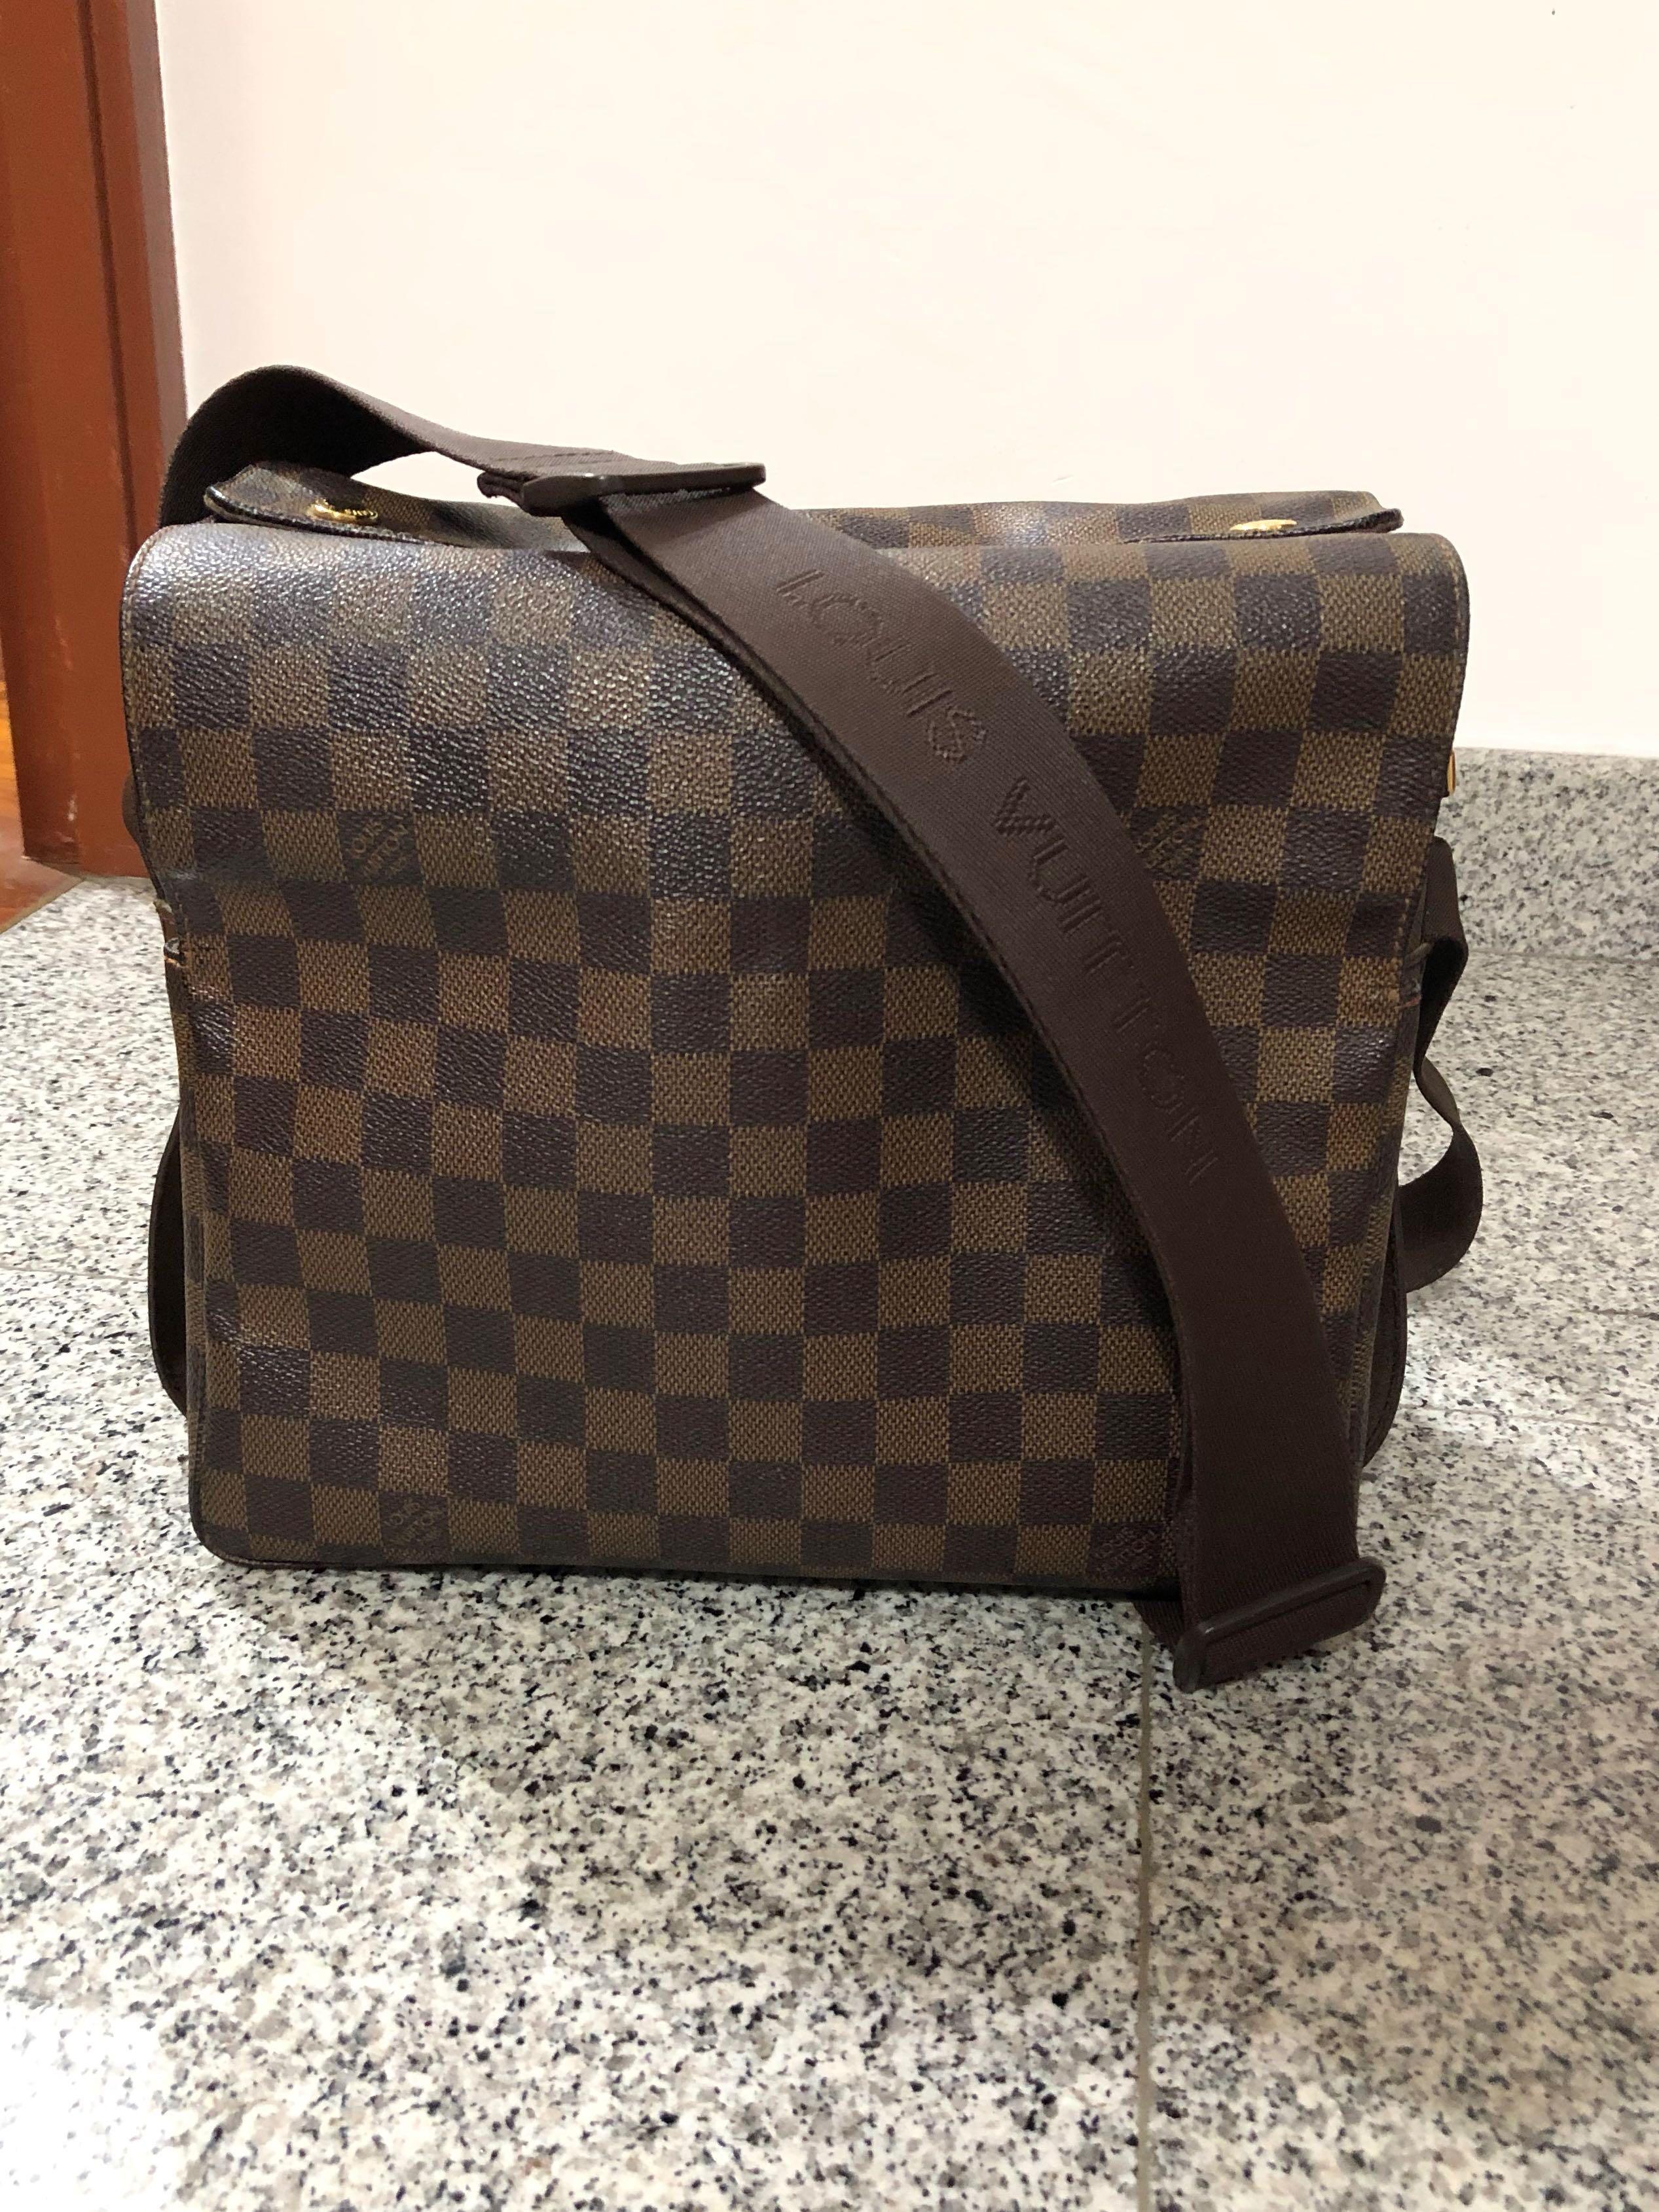 32f6ad2880a0 Louis Vuitton Sling Bag Messenger Naviglo Damier Ebene